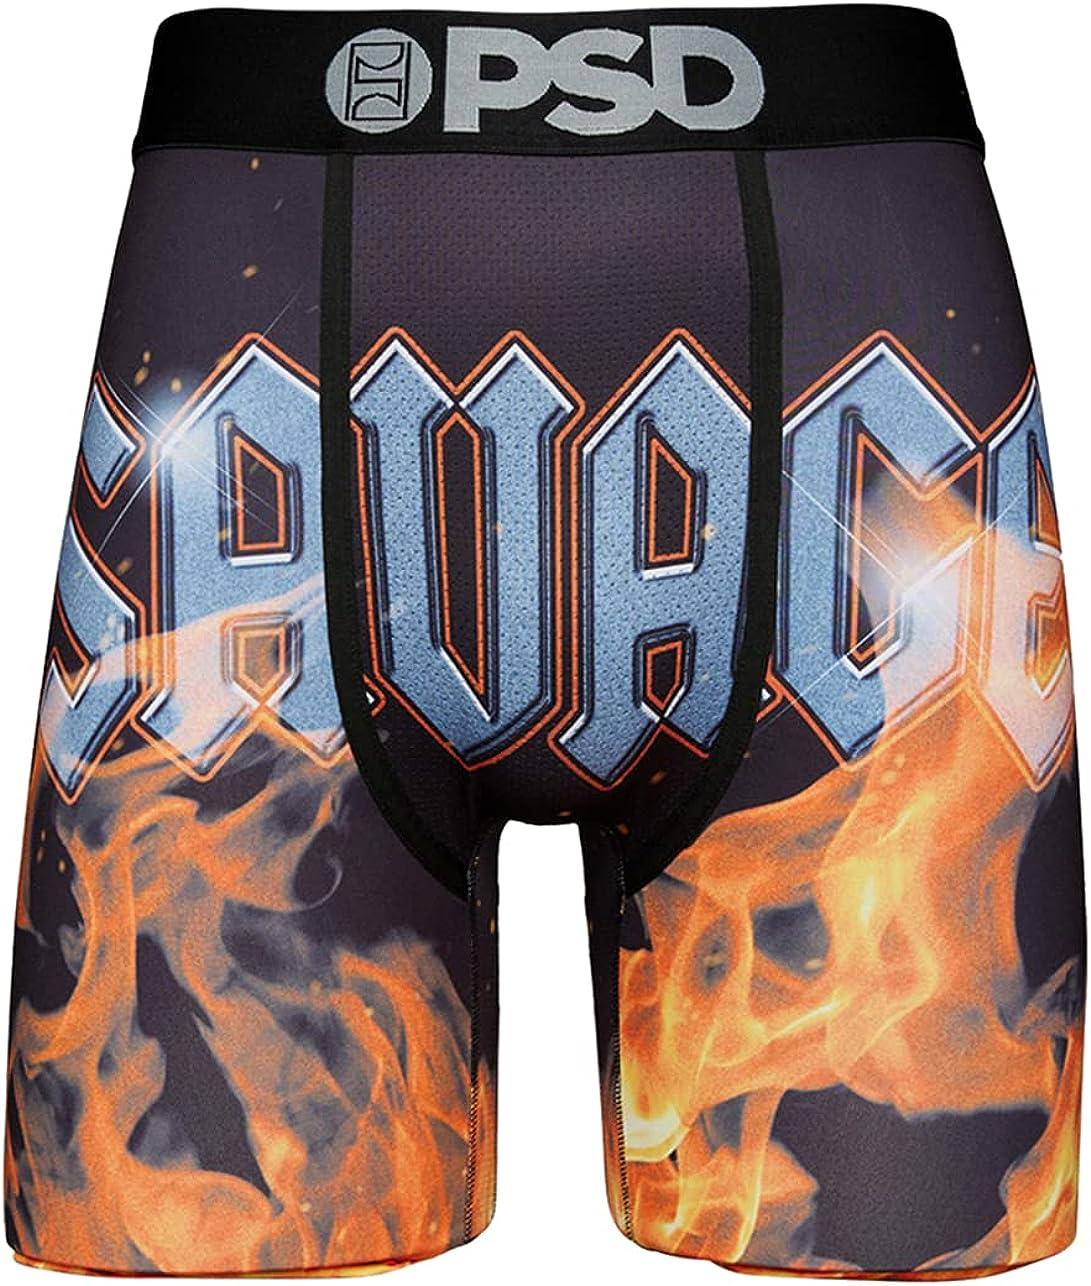 PSD Underwear Men's Savage Flames Printed Boxer Brief